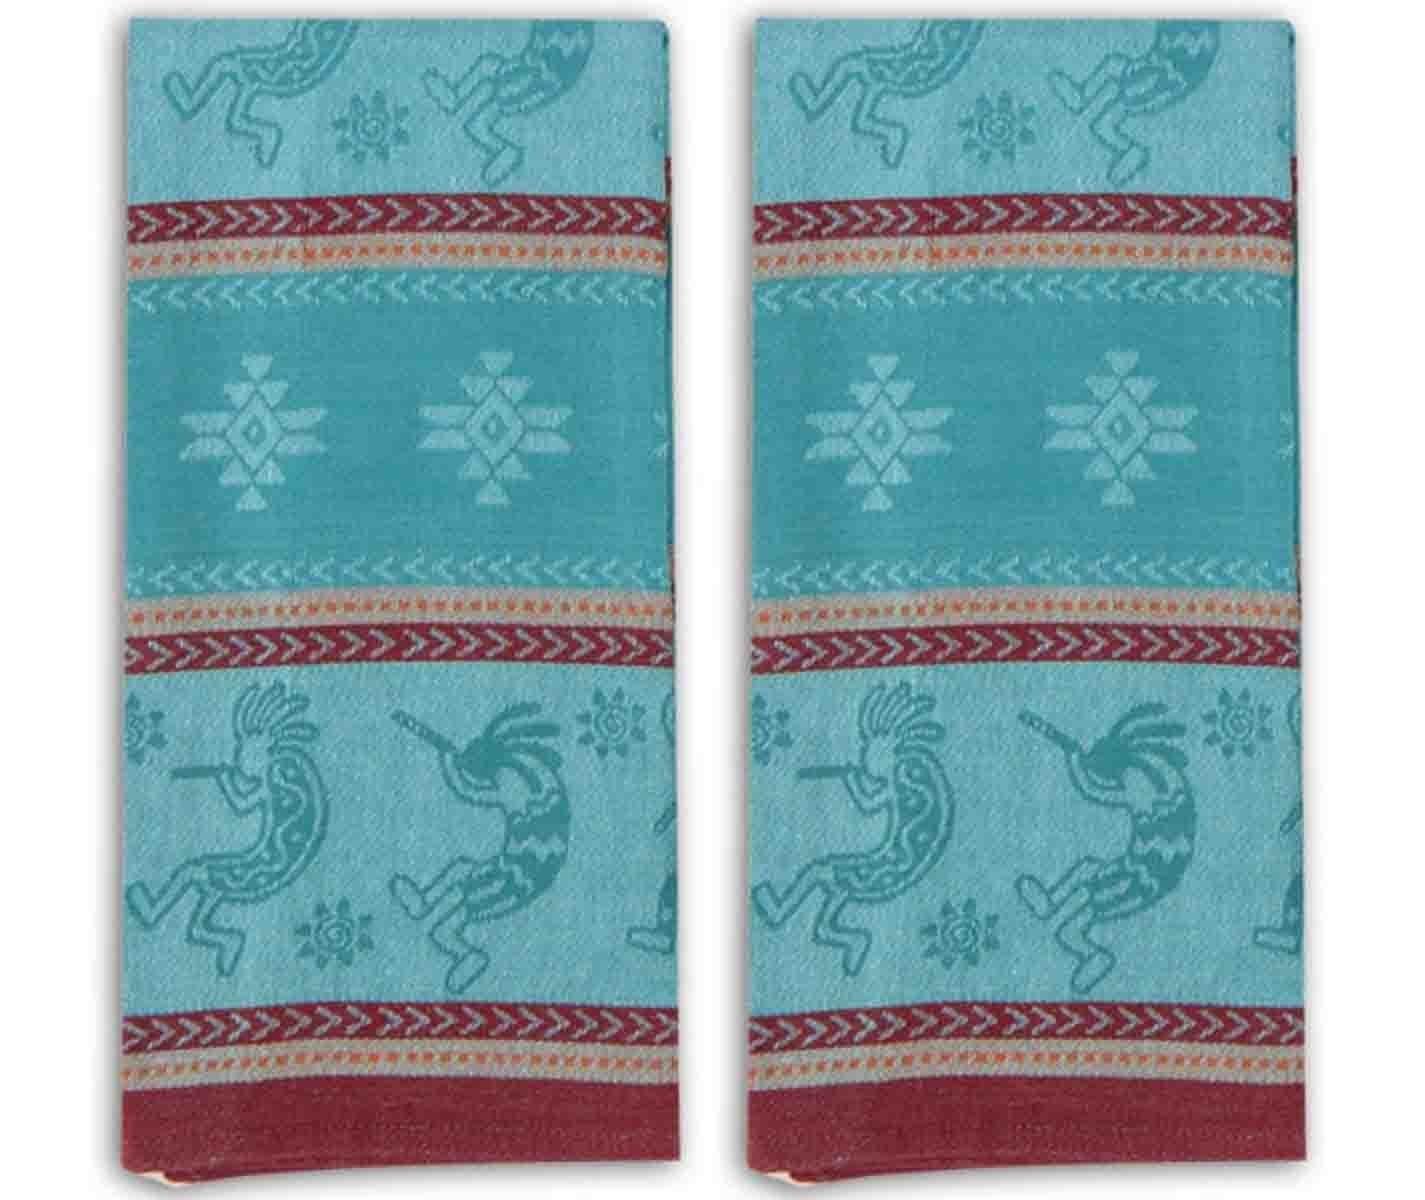 Amazon.com: Kokopelli Embossed Jacquard Kitchen Tea Towels Set of 2 ...